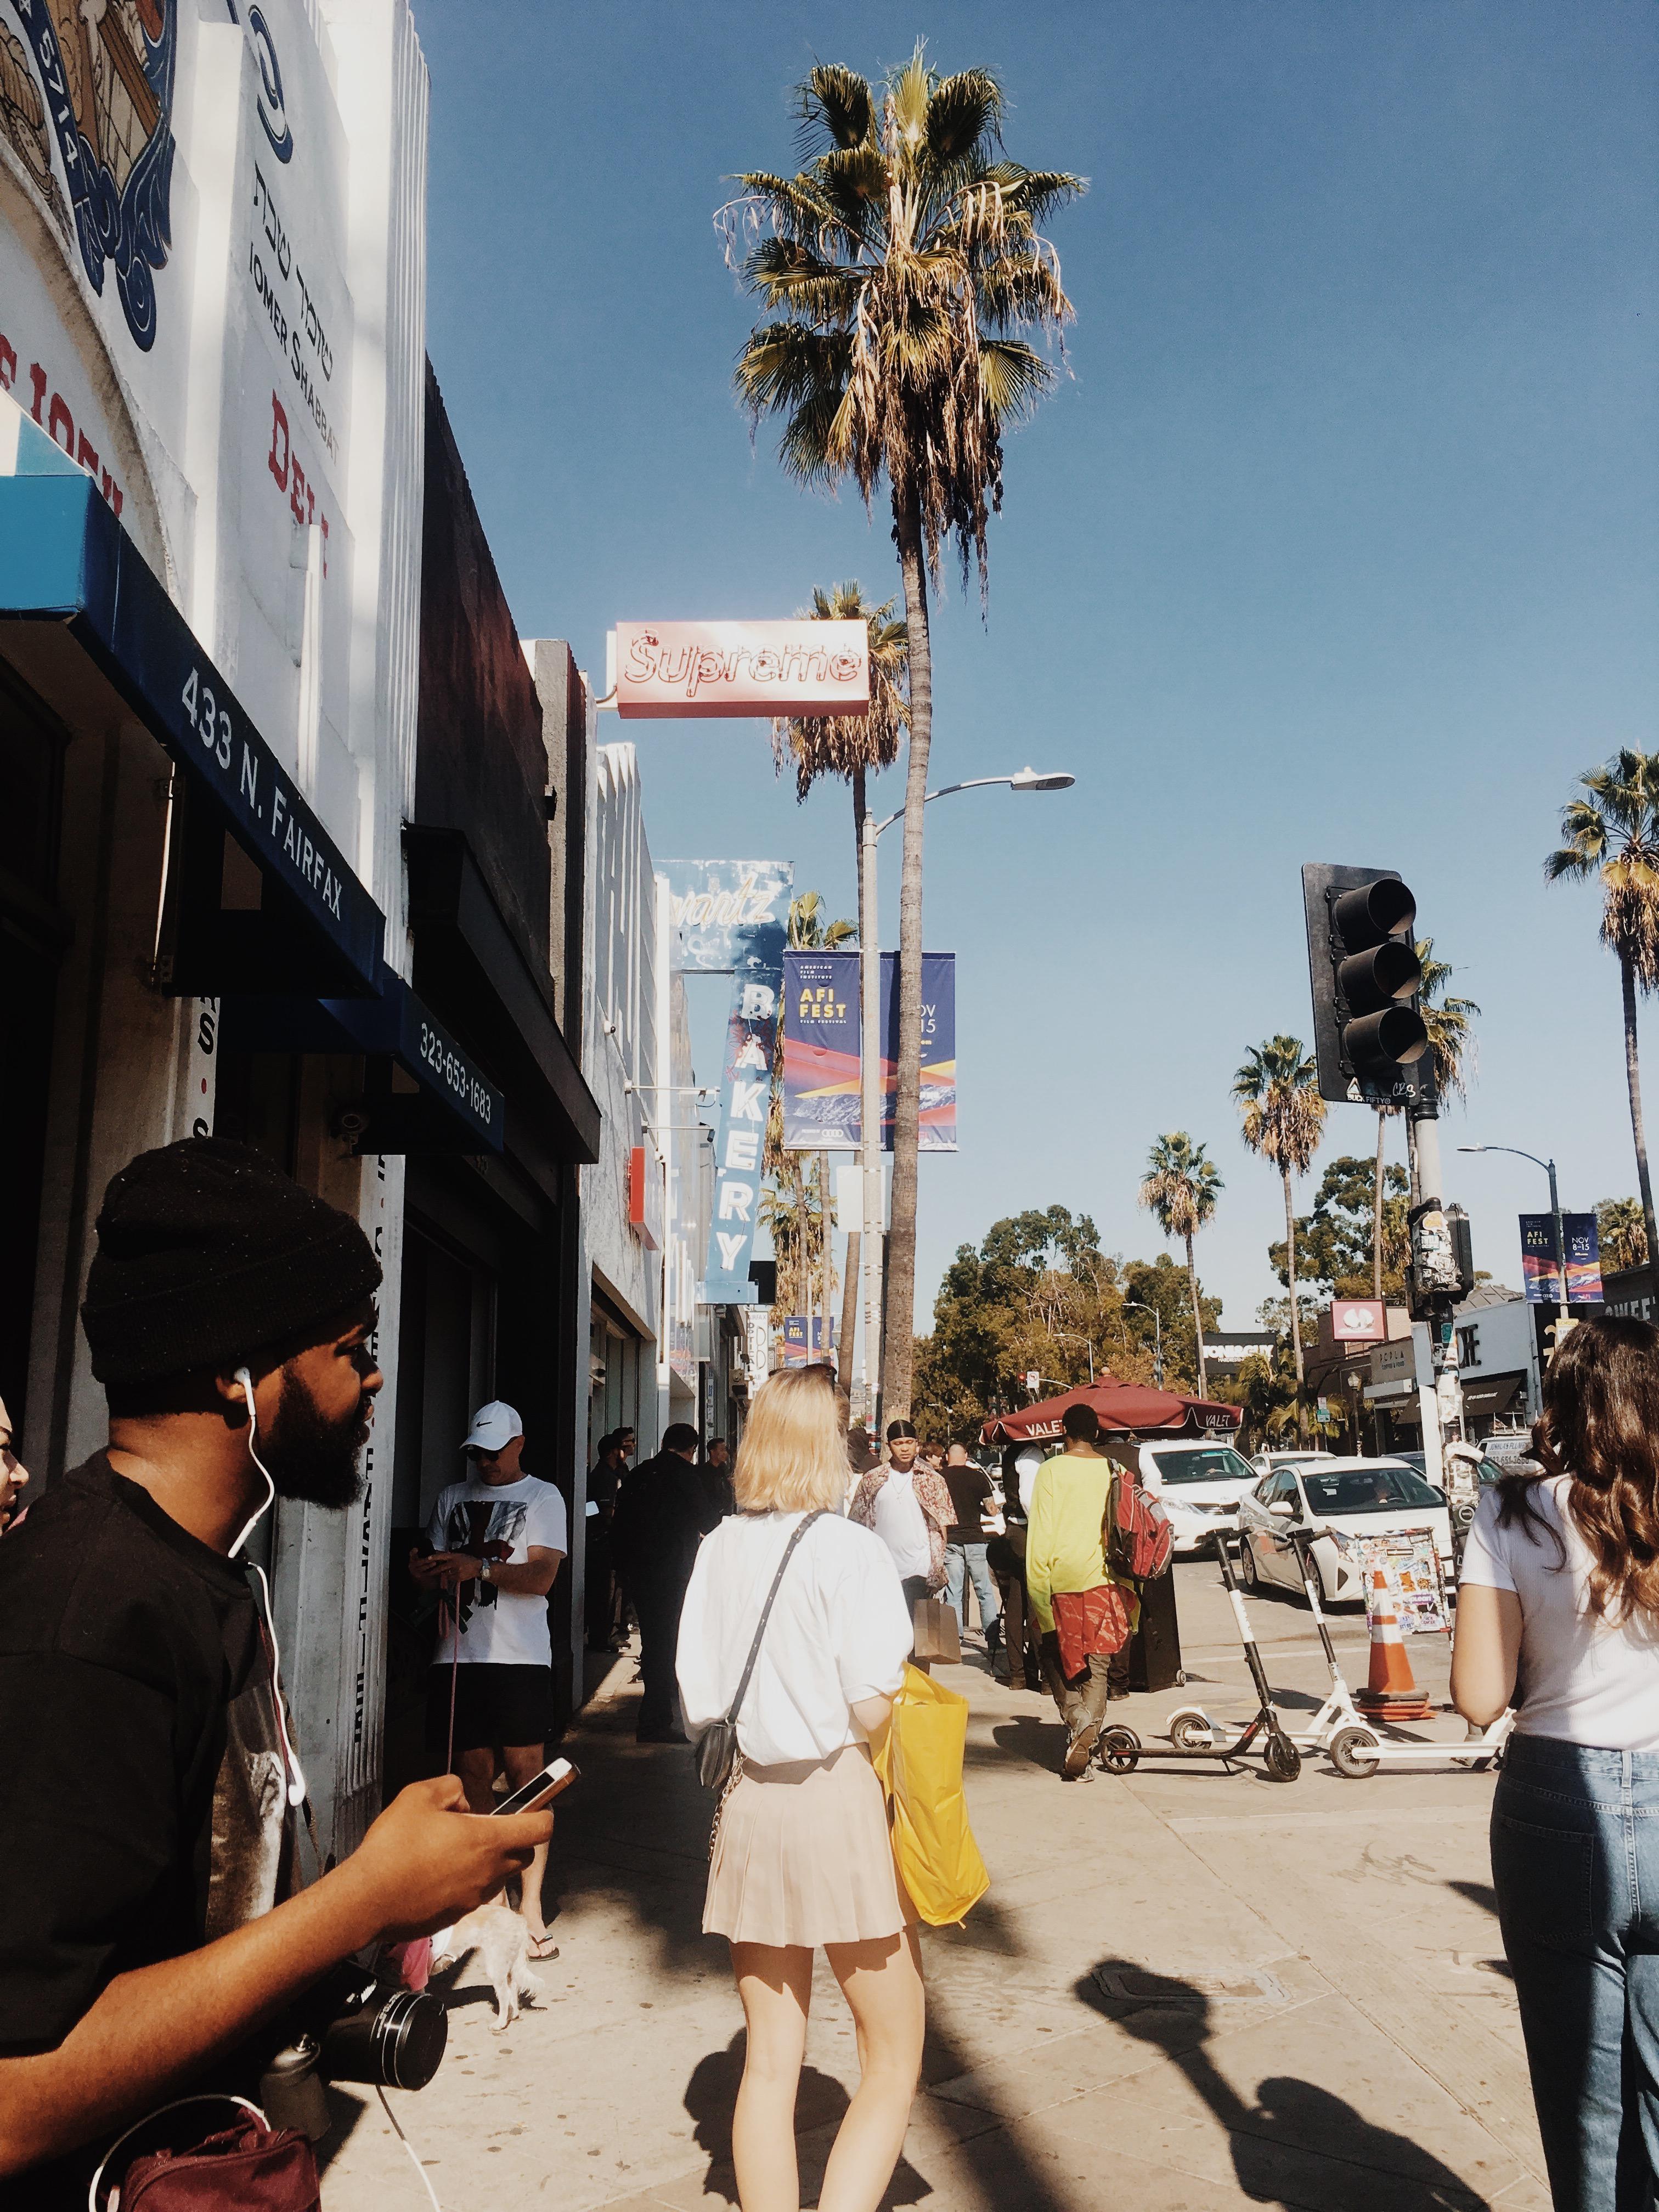 [object object] Converse X : #RatedOneStar Los Angeles Experience A2A21625 B0D7 4187 983D C4700E752FE0